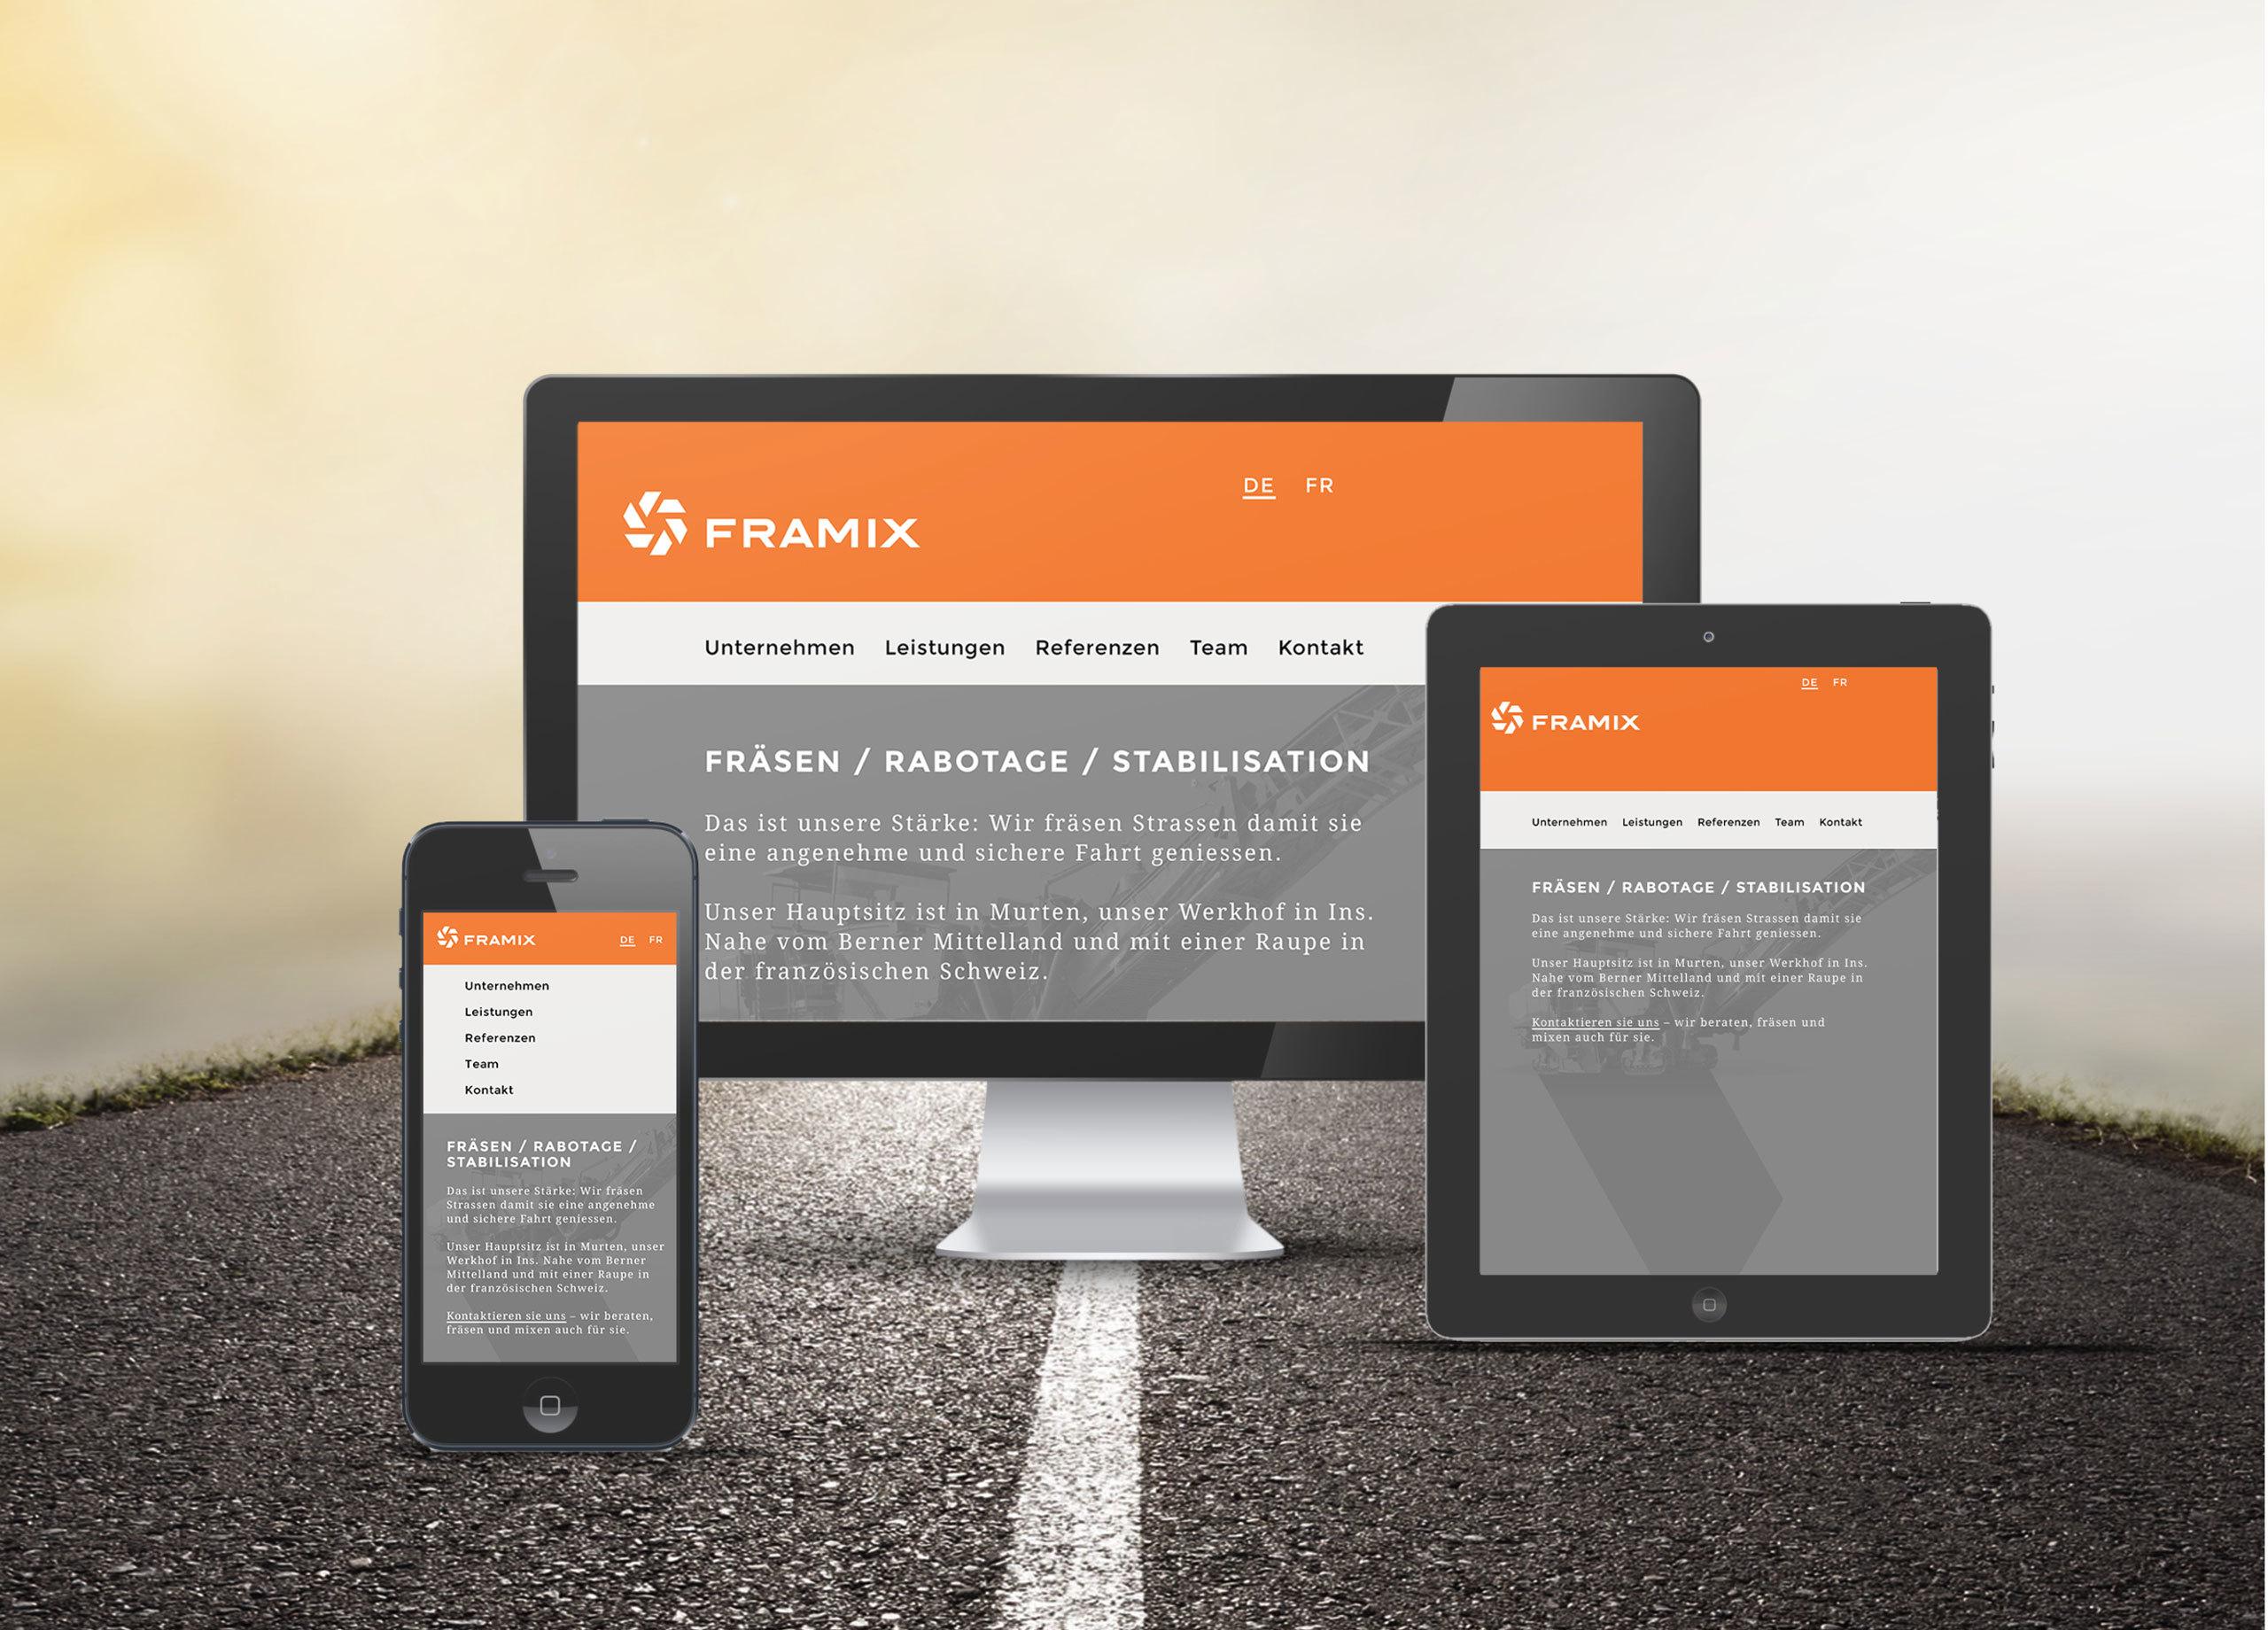 Framix Web MHG Bern